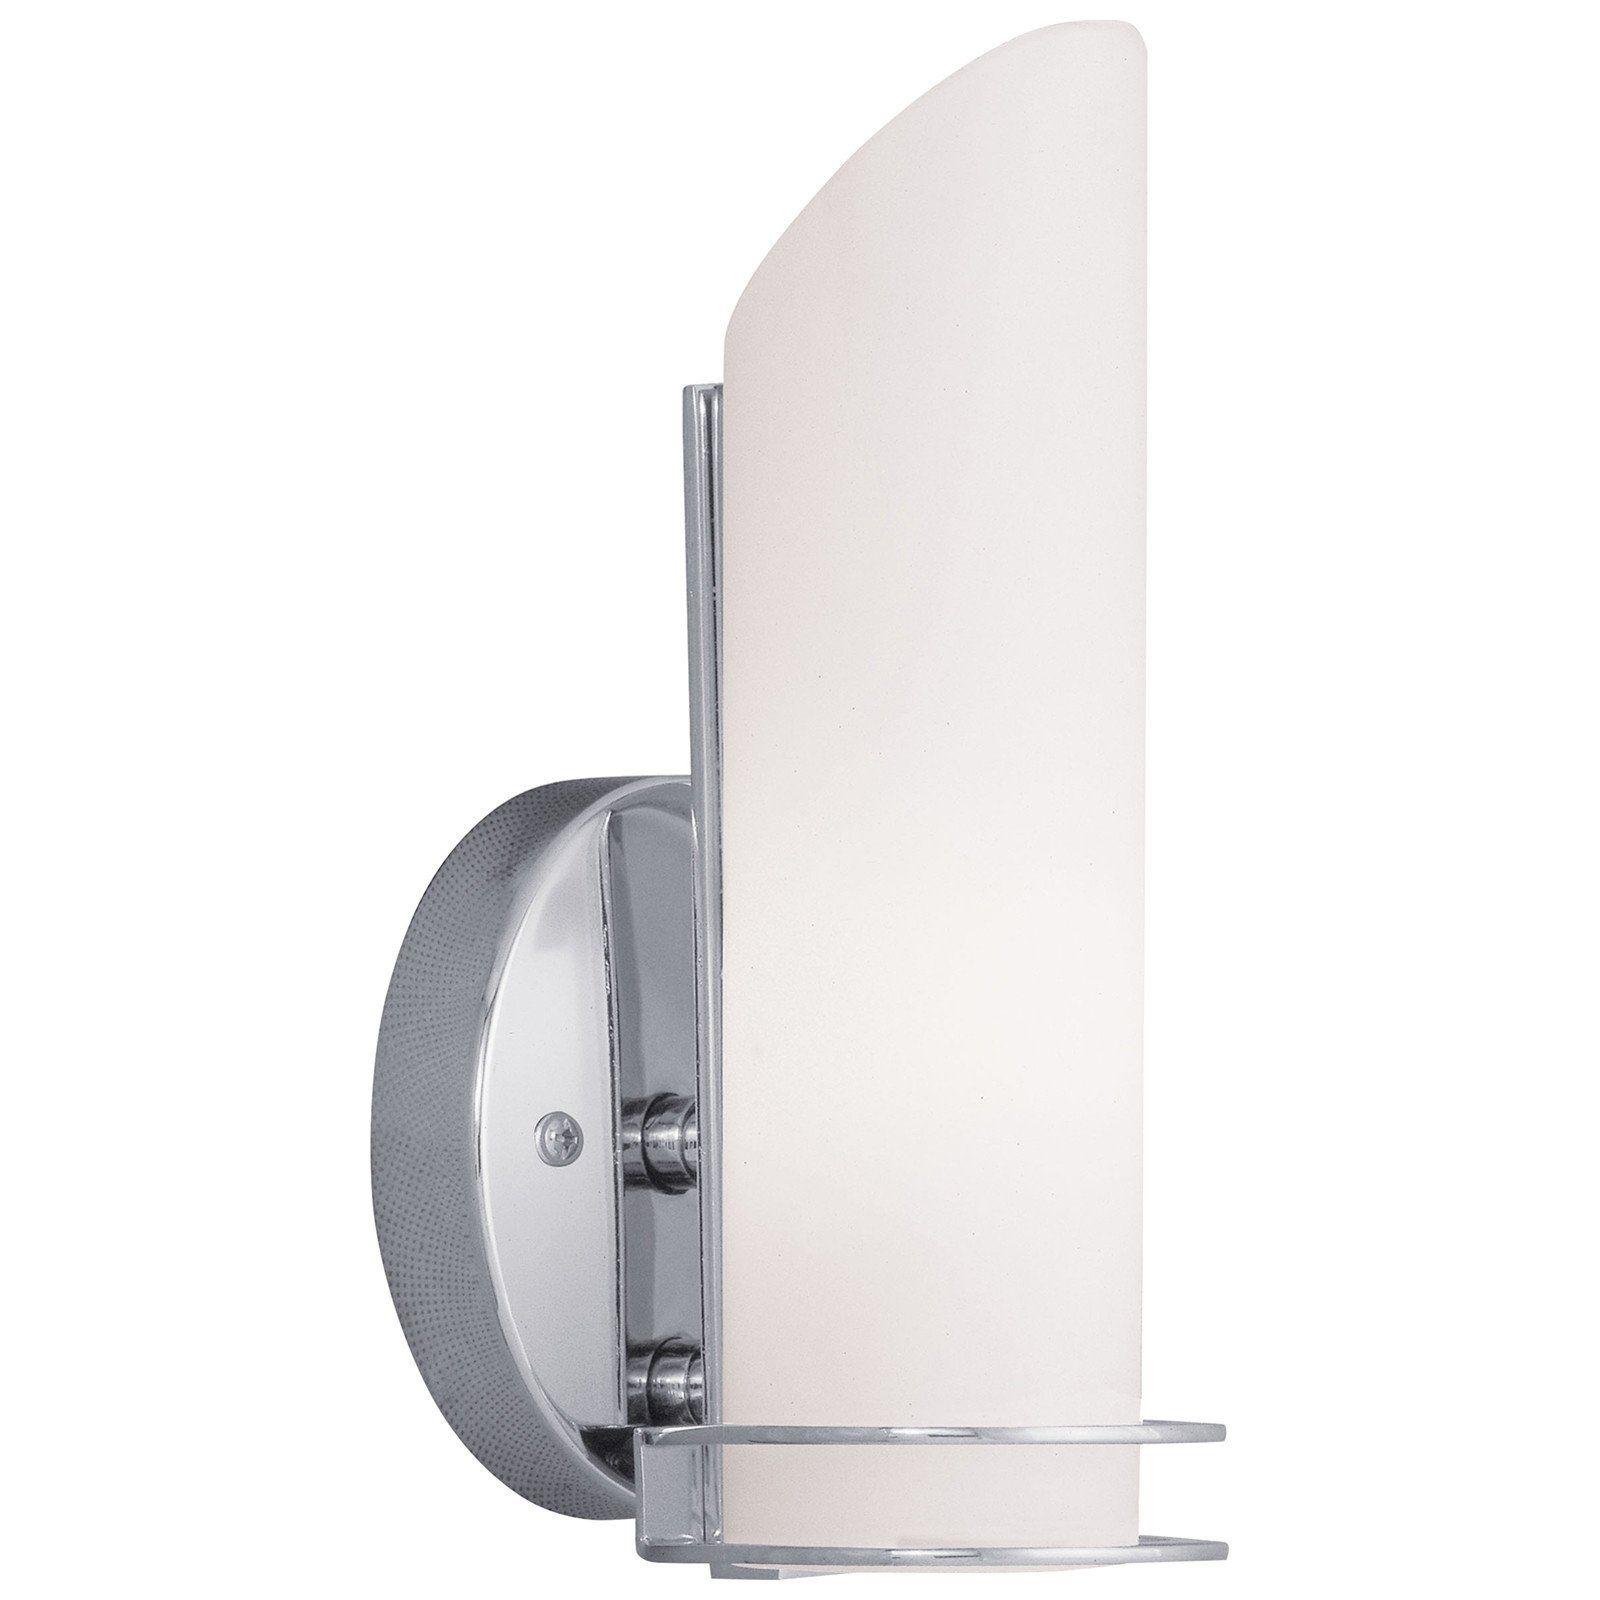 Pelham 1-Light Bath Light/ Wall Sconce in Polished Chrome ... on Height Of Bathroom Sconce Lights id=46012